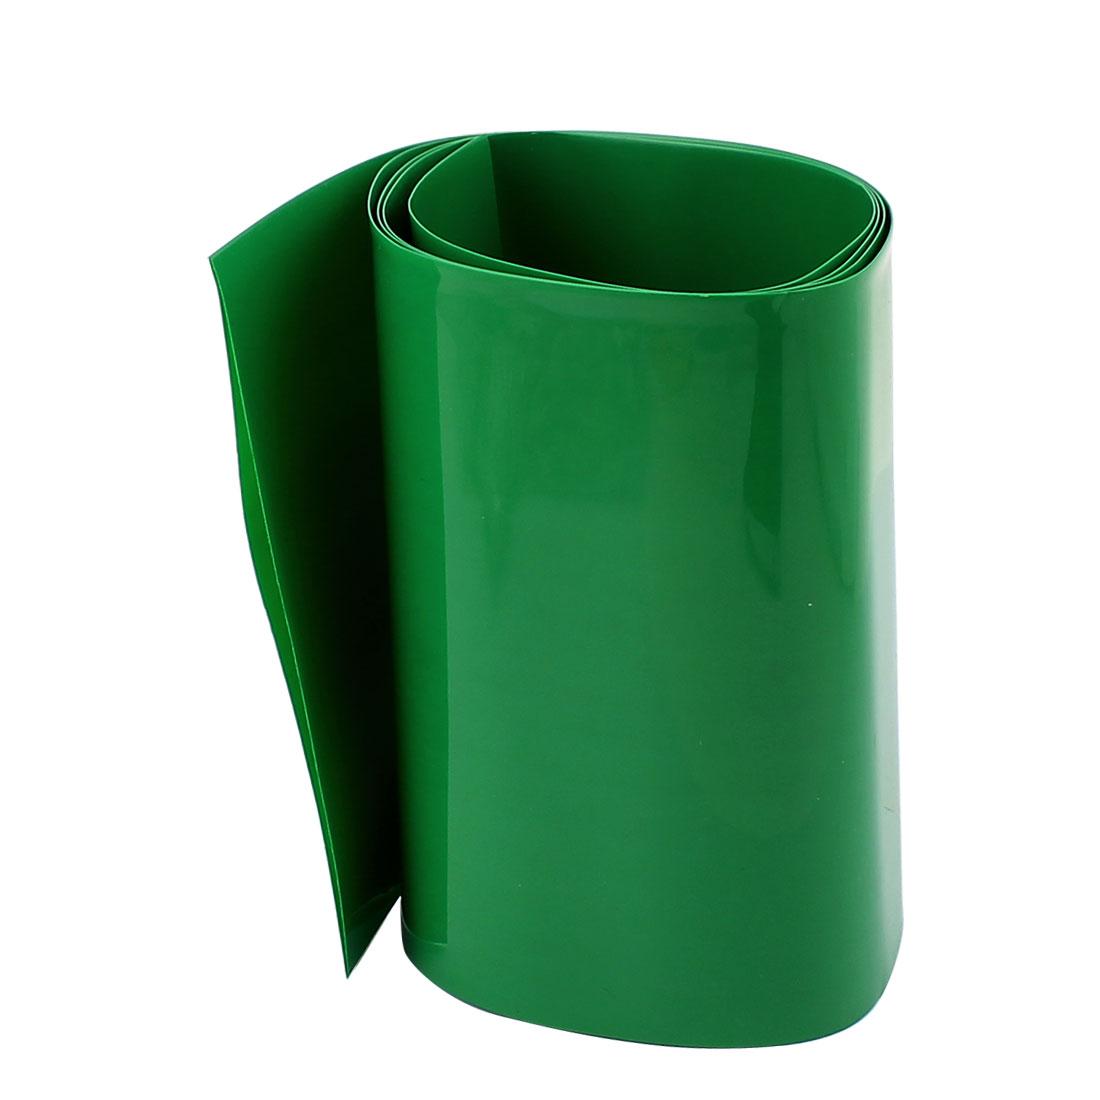 3.3ft 103mm Flat 65mm Dia PVC Heat Shrink Tubing Green for 18650 Battery